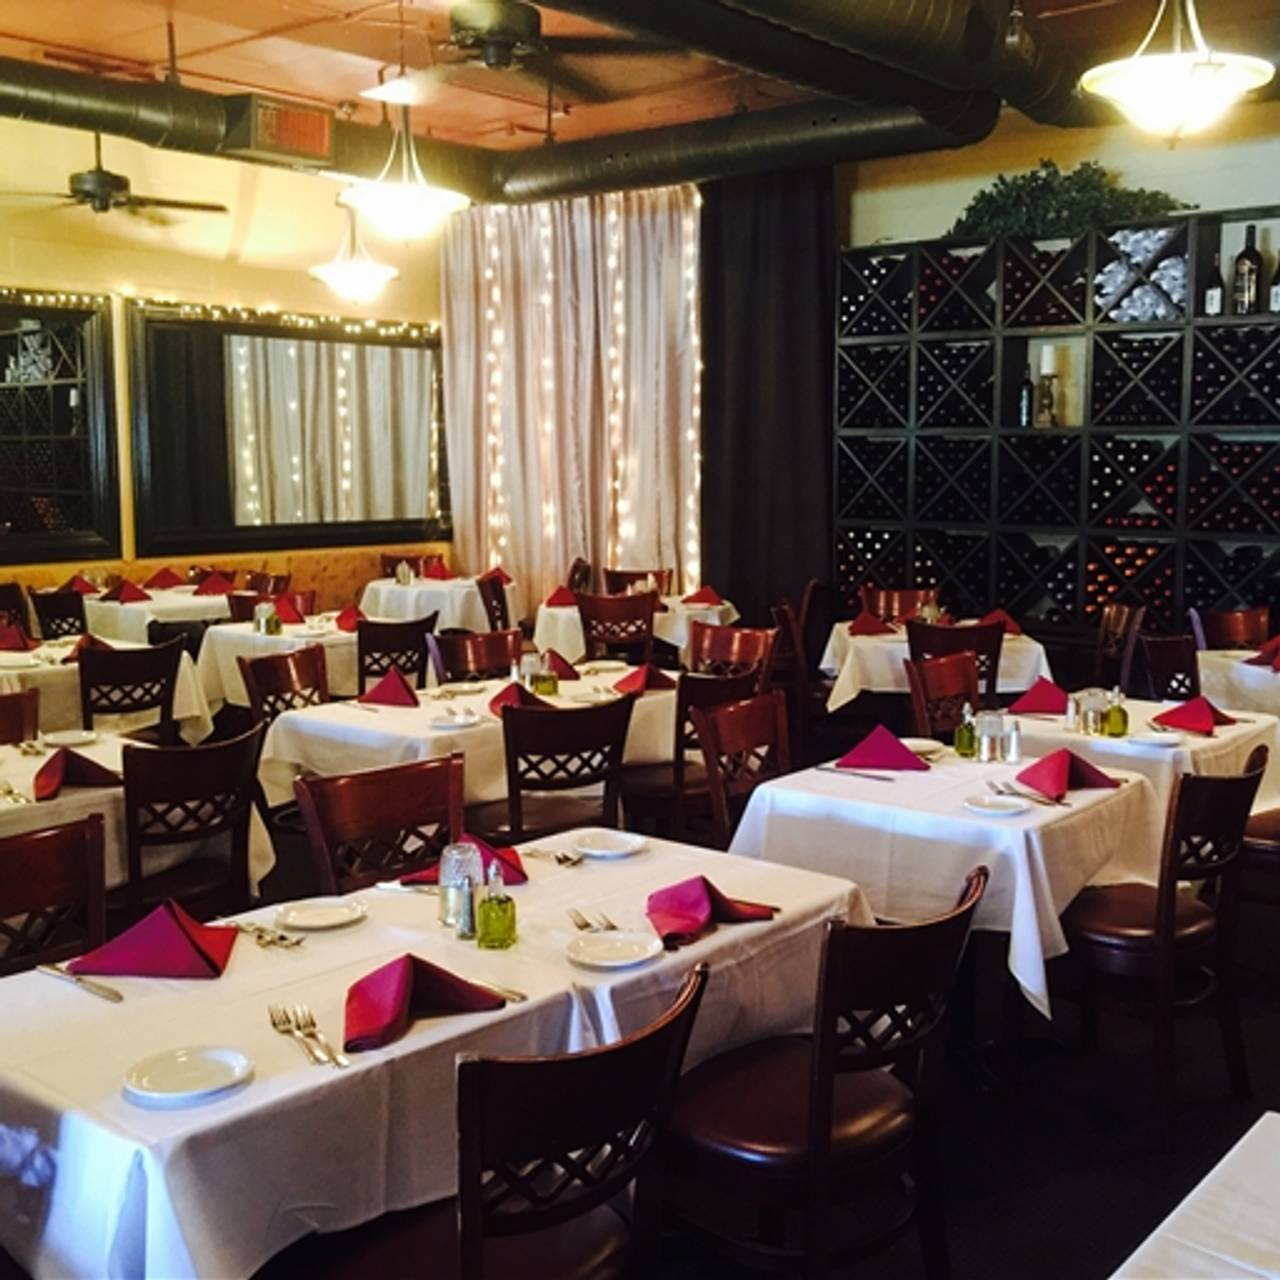 Montecatini Restaurant Walnut Creek Walnut Creek Ca Opentable